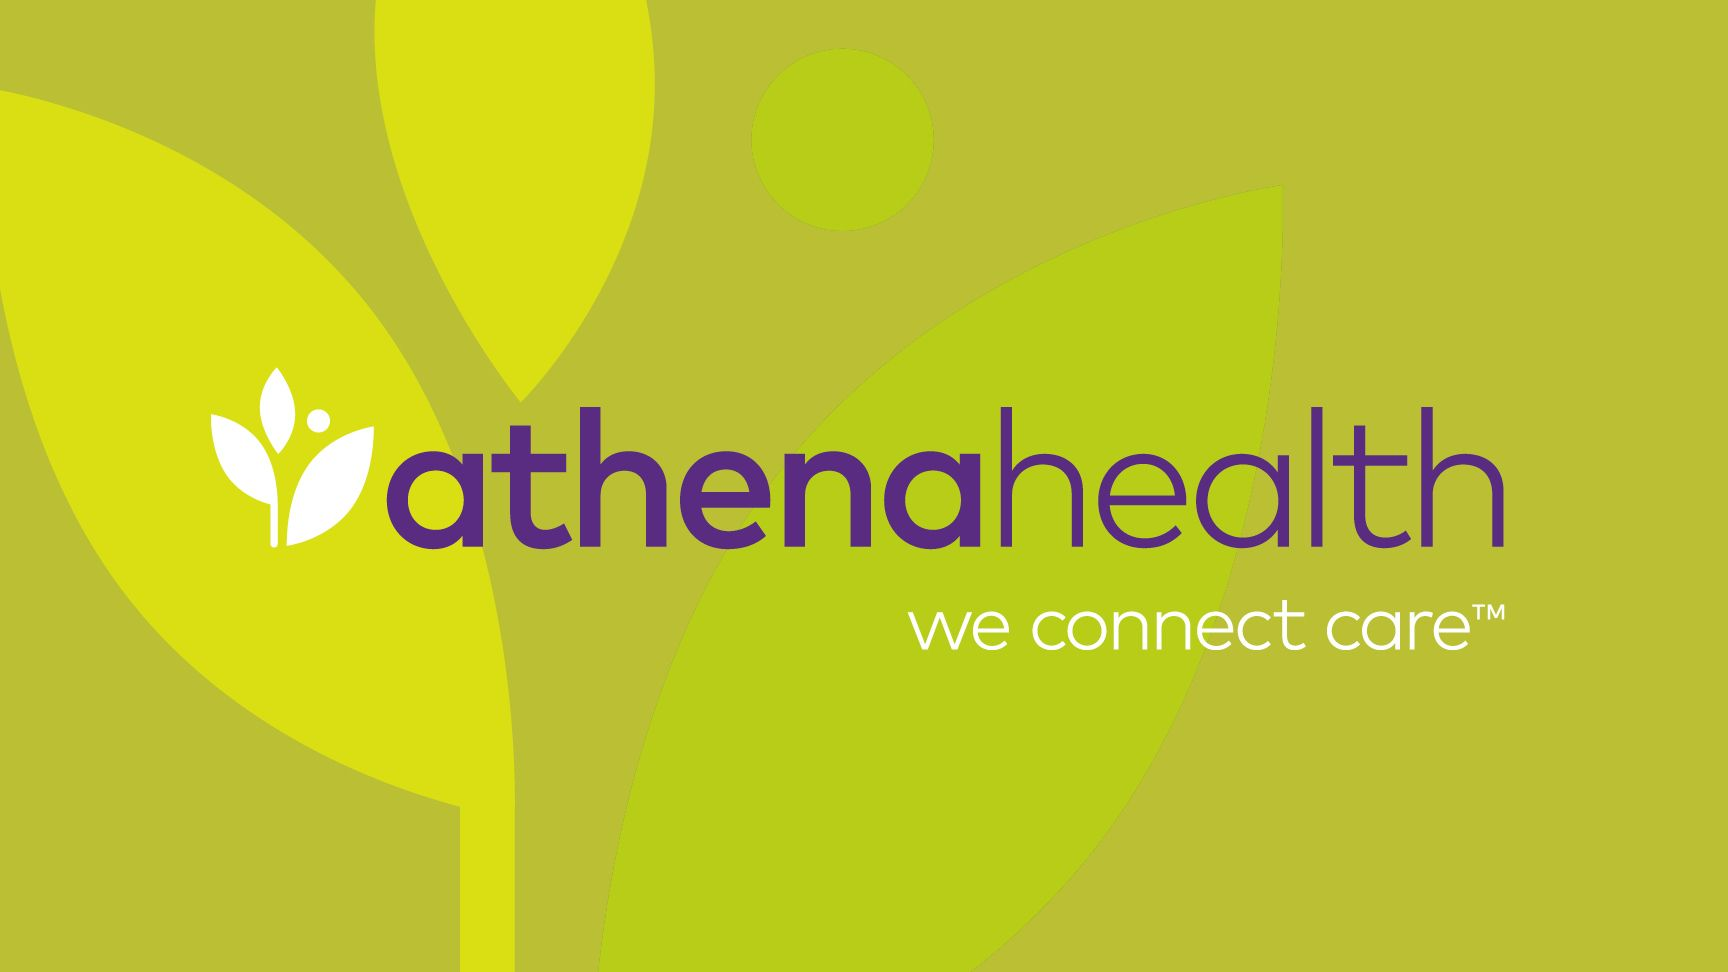 Athenahealth Tank Design Medical Practice Cloud Based Services Tank Design